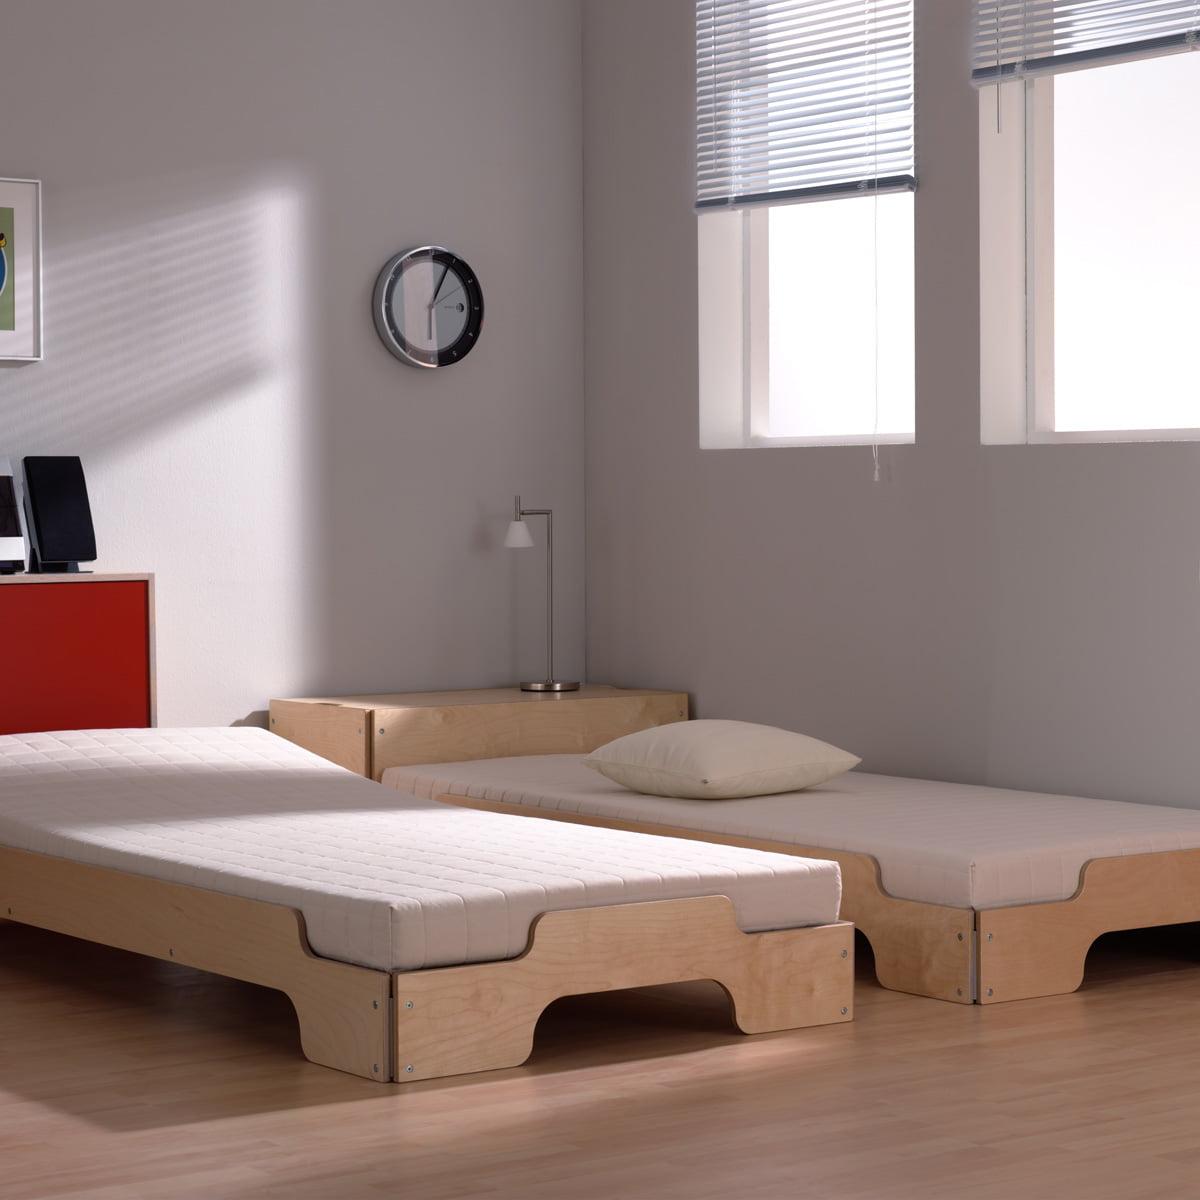 Stacking Bed / Modular System